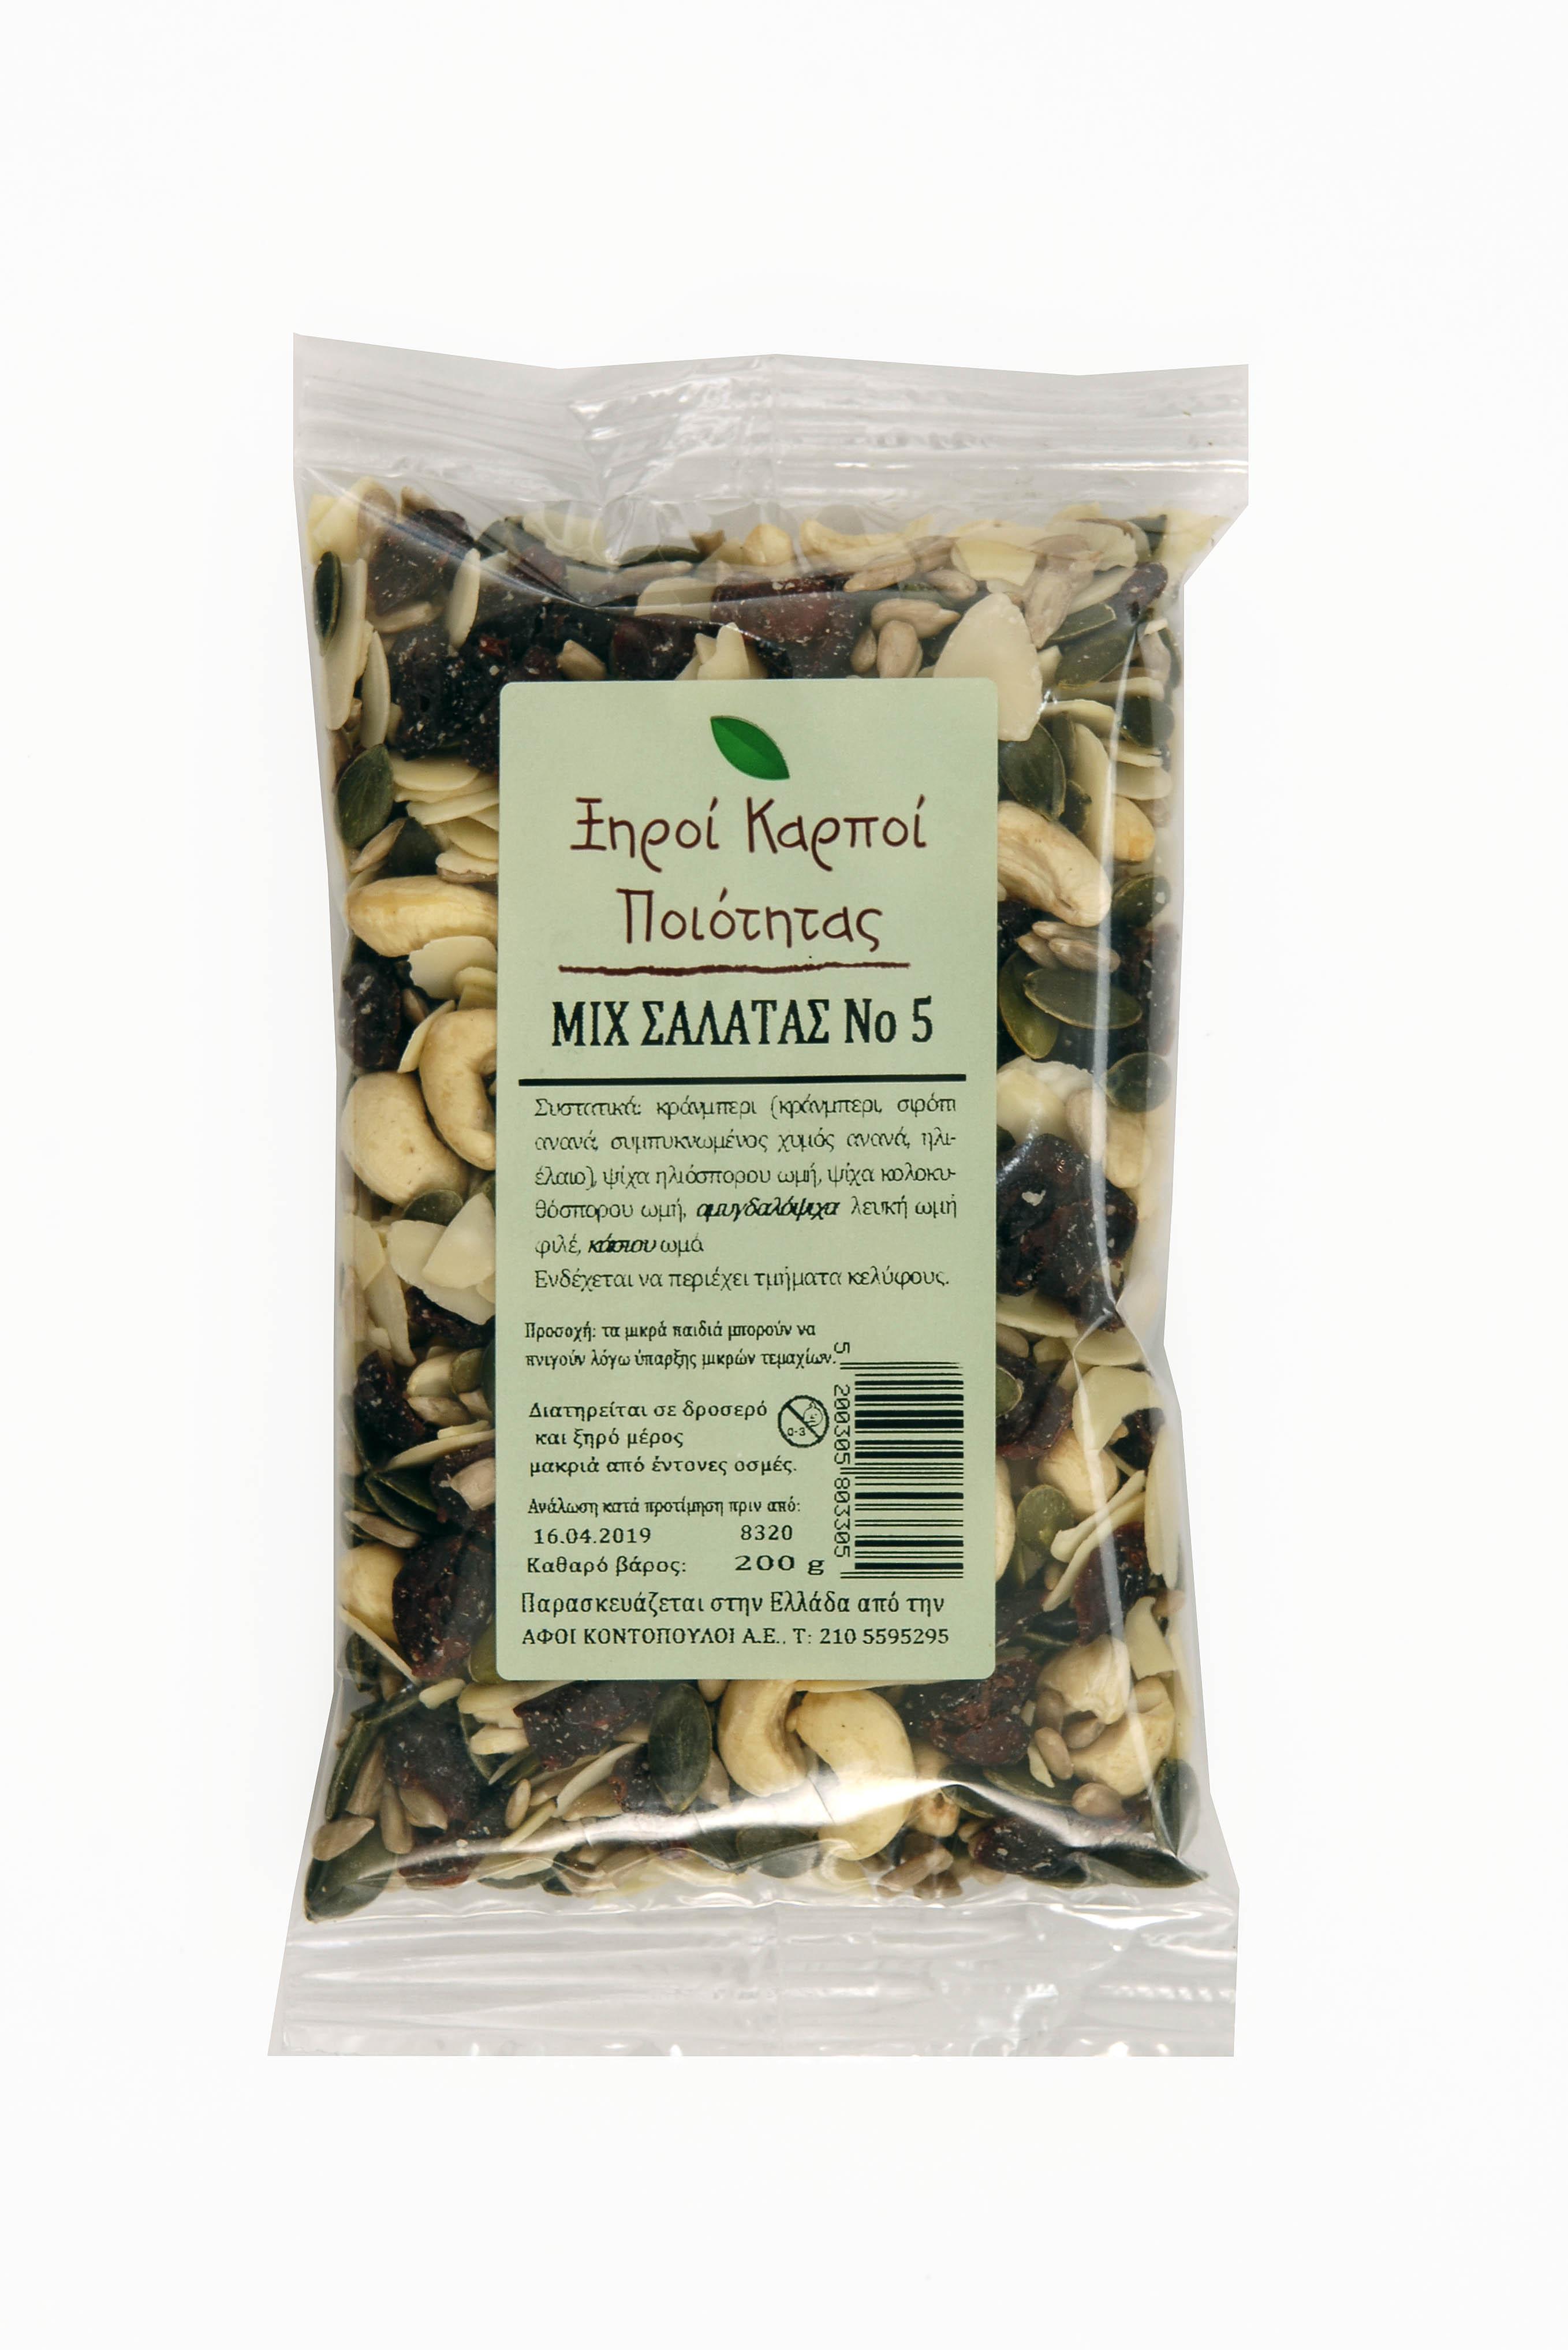 Mix Σαλάτας - Αμύγδαλο φιλέ - Κάσιου ωμό - Ψίχα κολοκυθόσπορου - Ψίχα Hλιόσπορου - Cranberry Αφοί Κοντόπουλοι (200g)